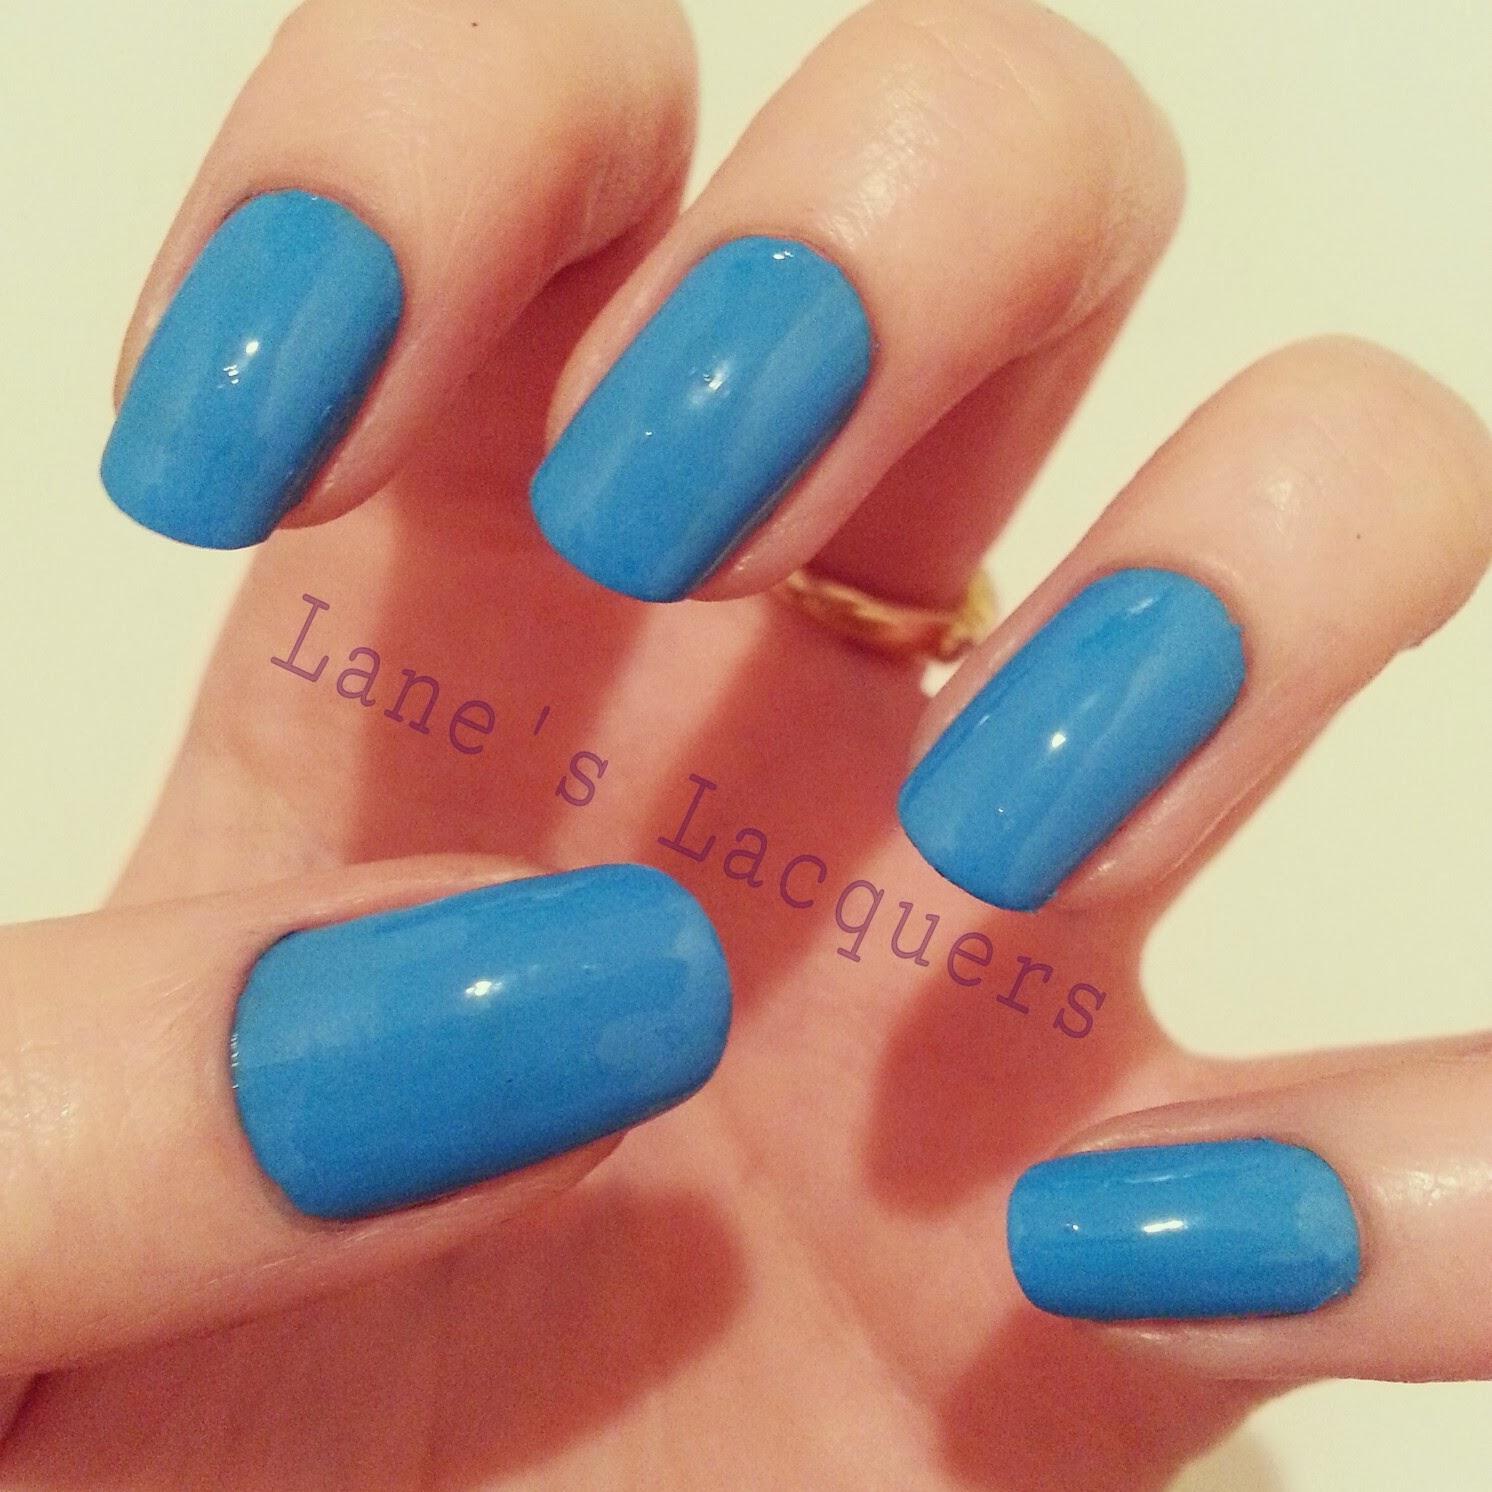 models-own-hypergels-blue-glint-manicure